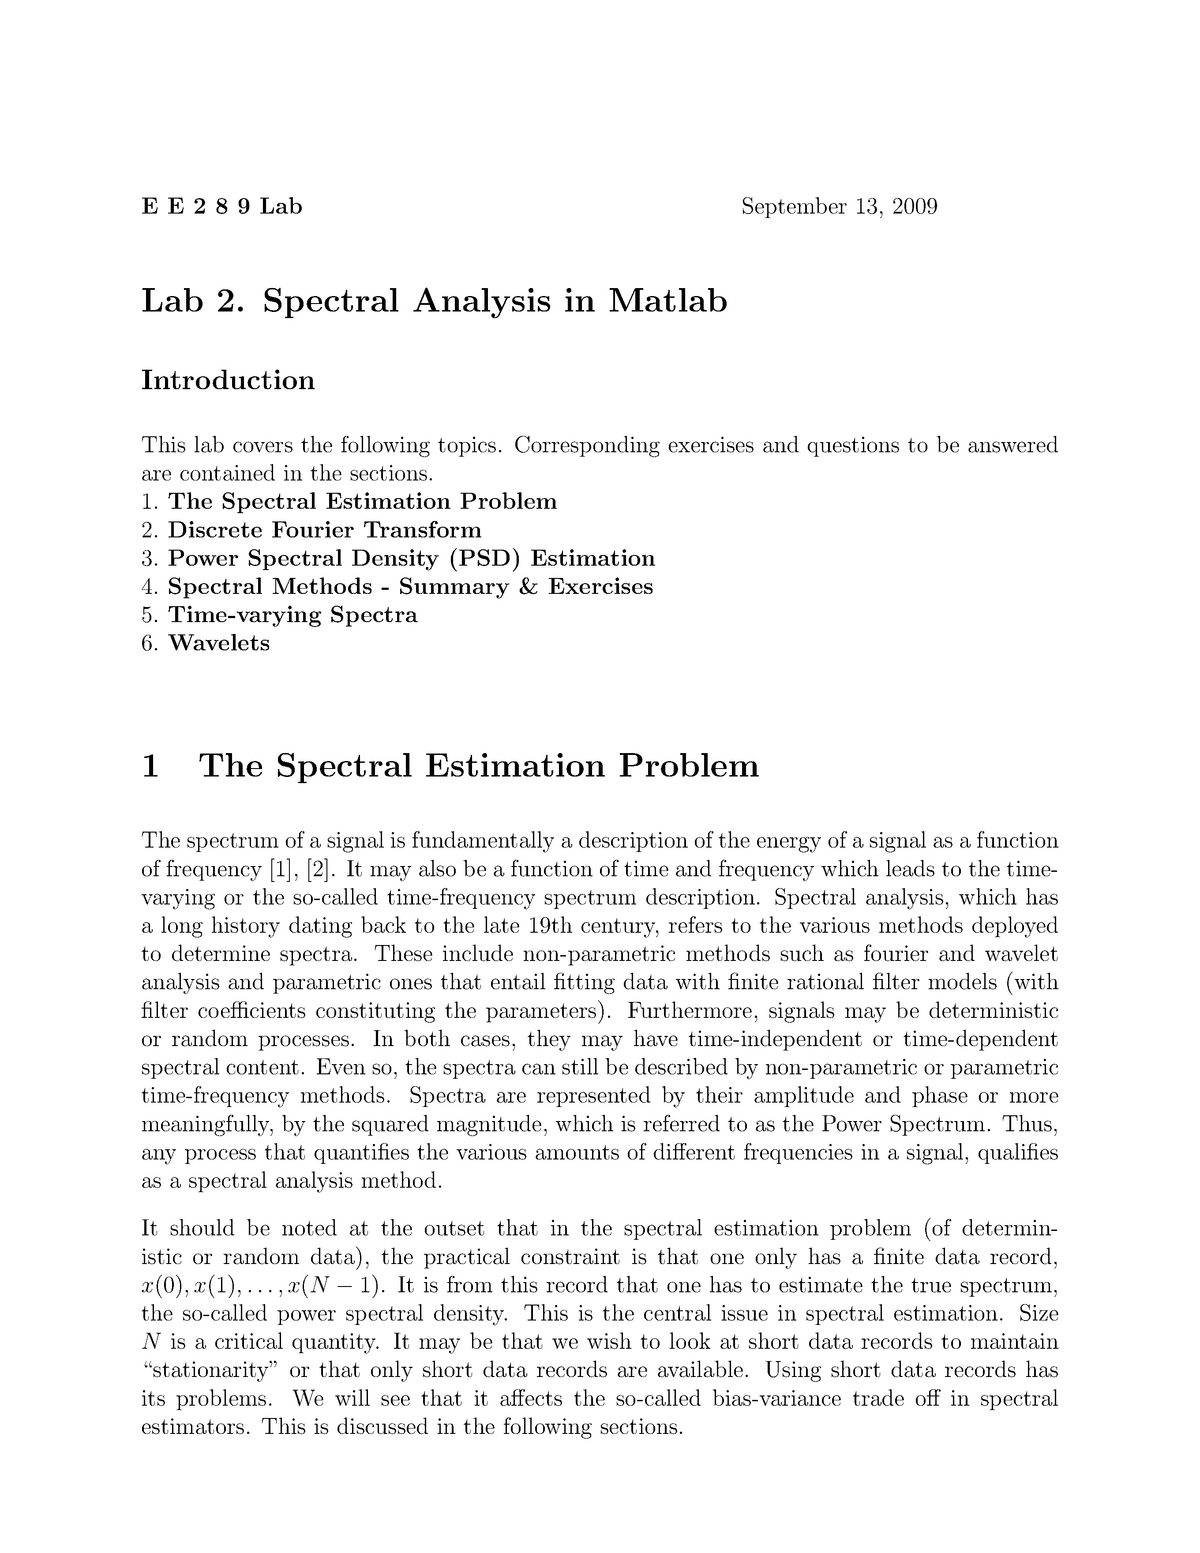 Spectral Analysis Matlab